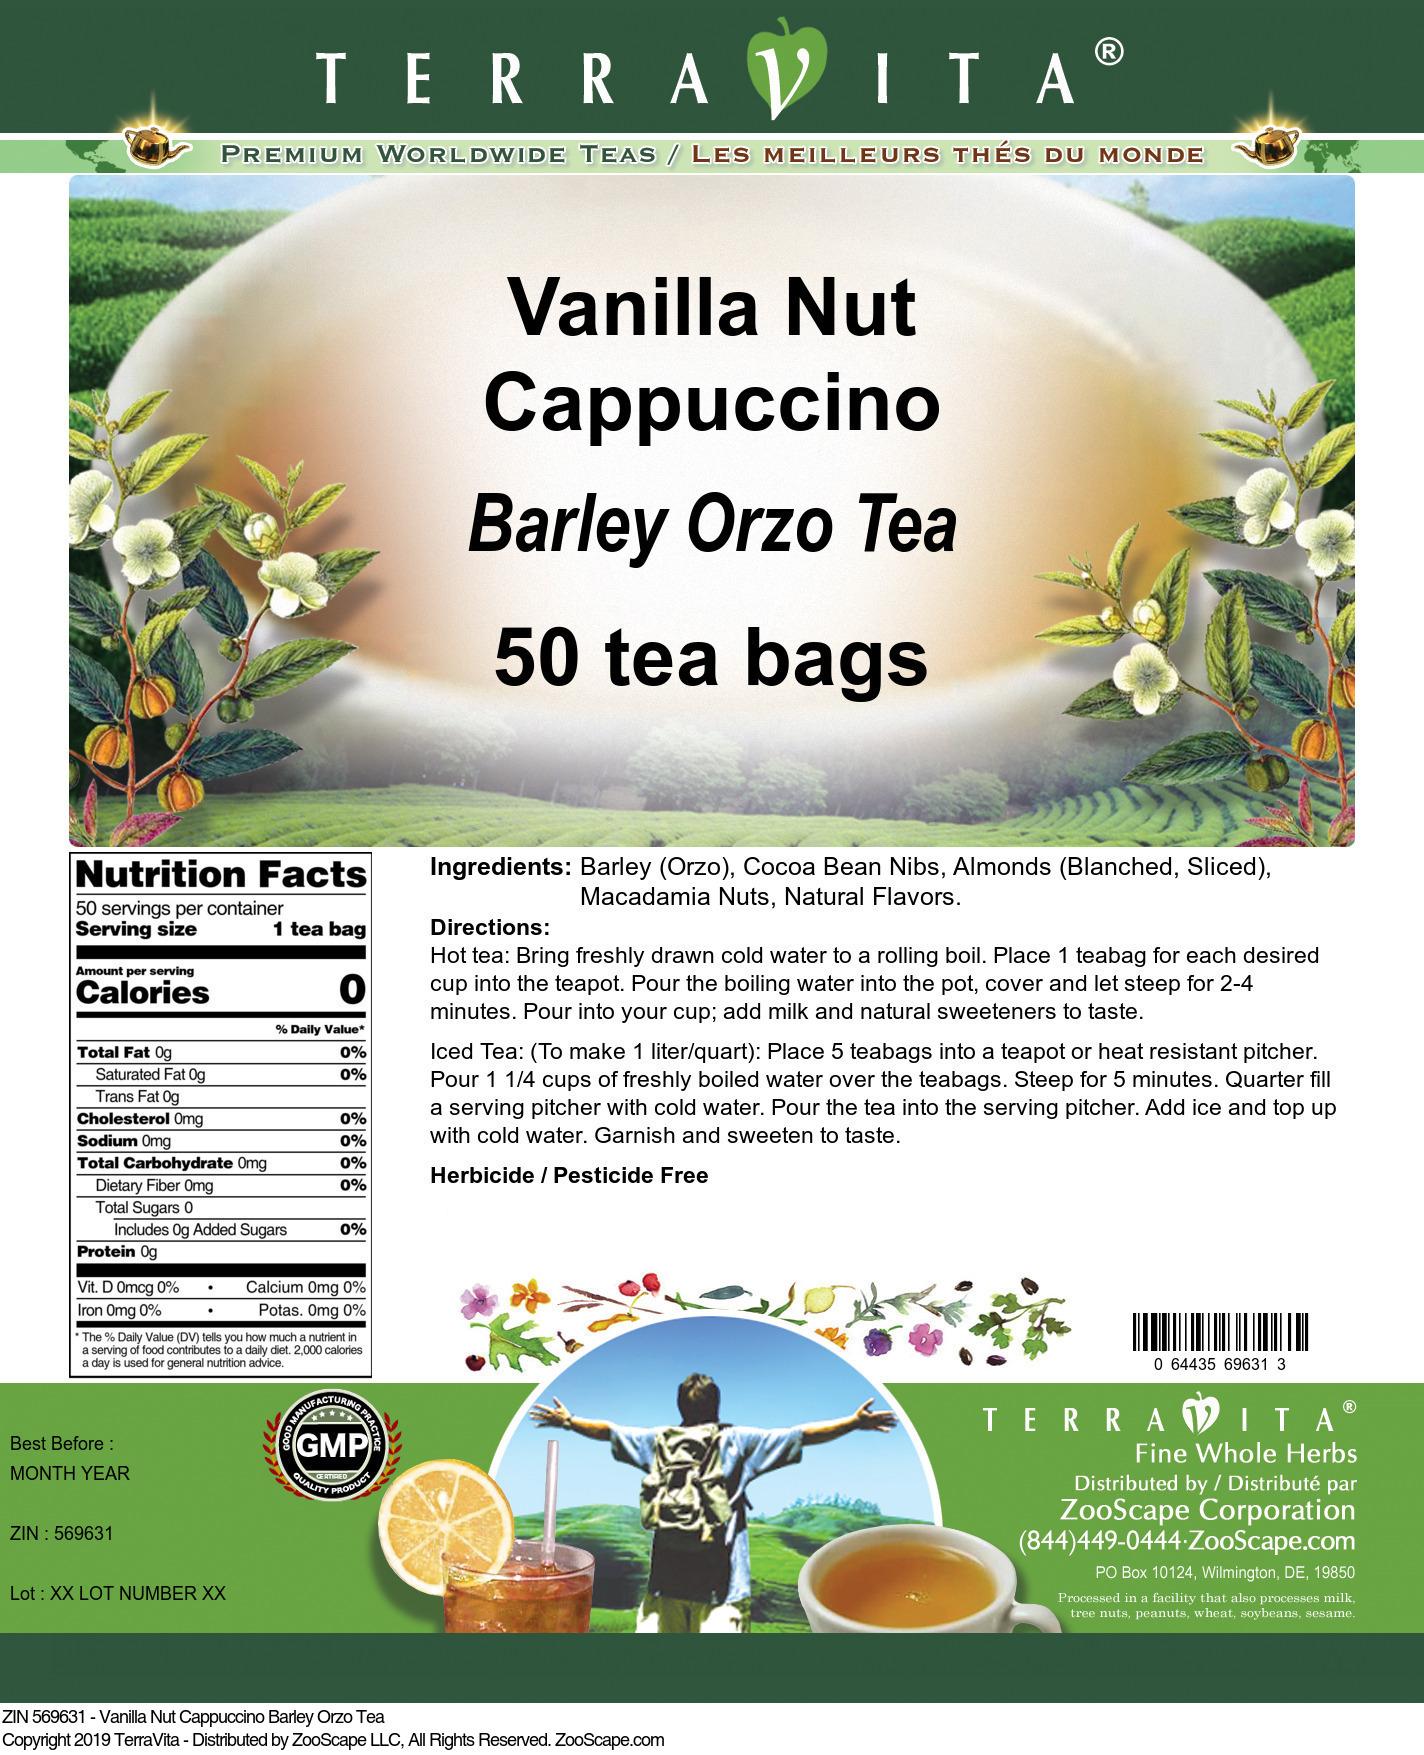 Vanilla Nut Cappuccino Barley Orzo Tea